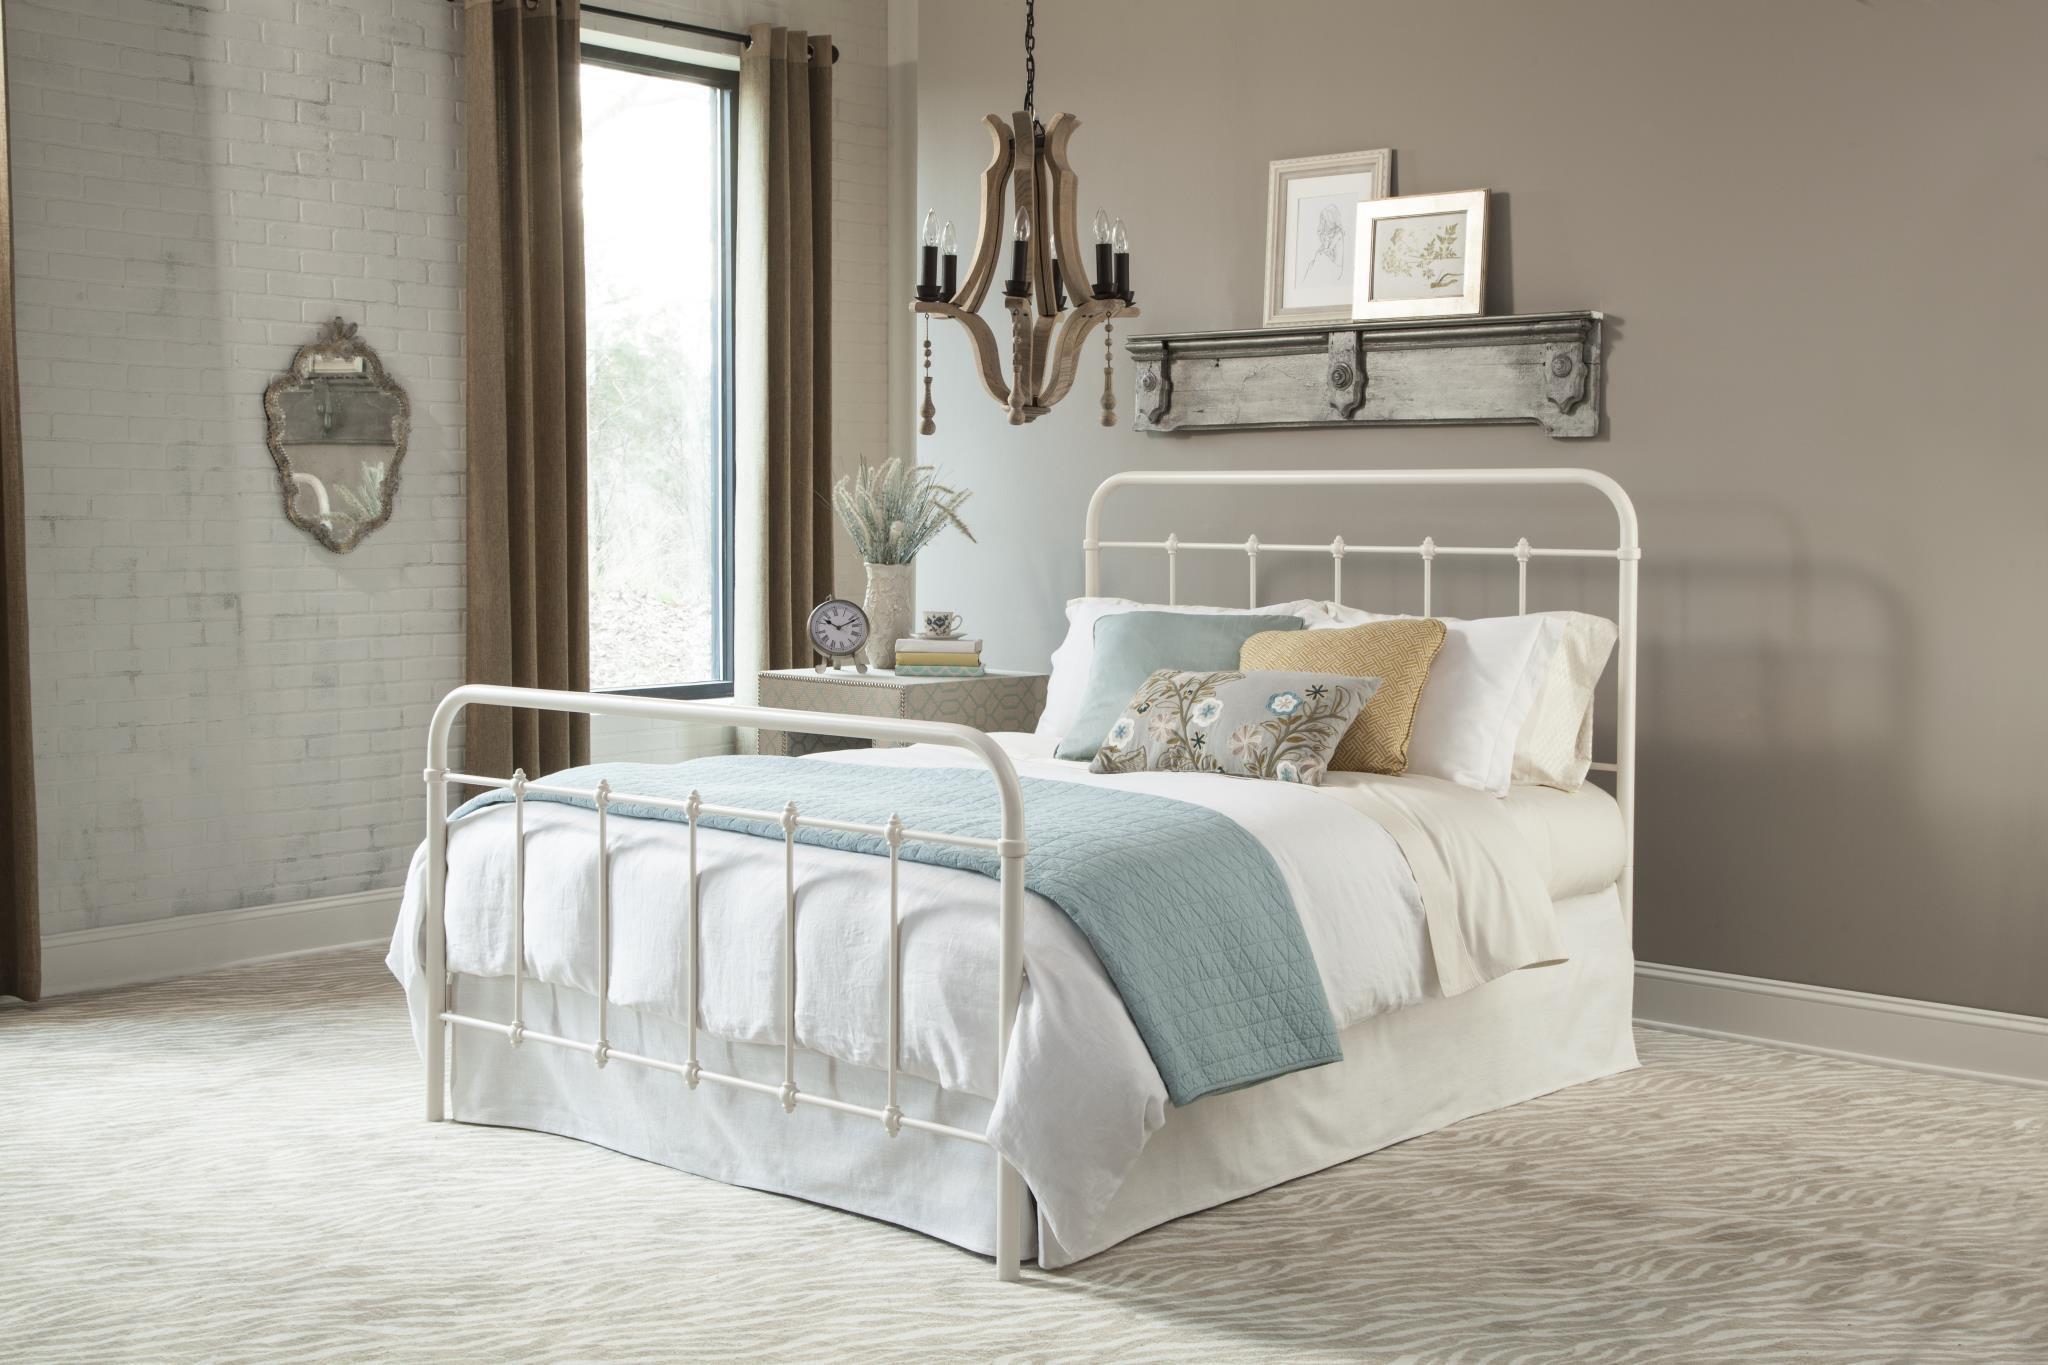 899 Twin Size Metal Bed by Kith Furniture at Furniture Fair - North Carolina